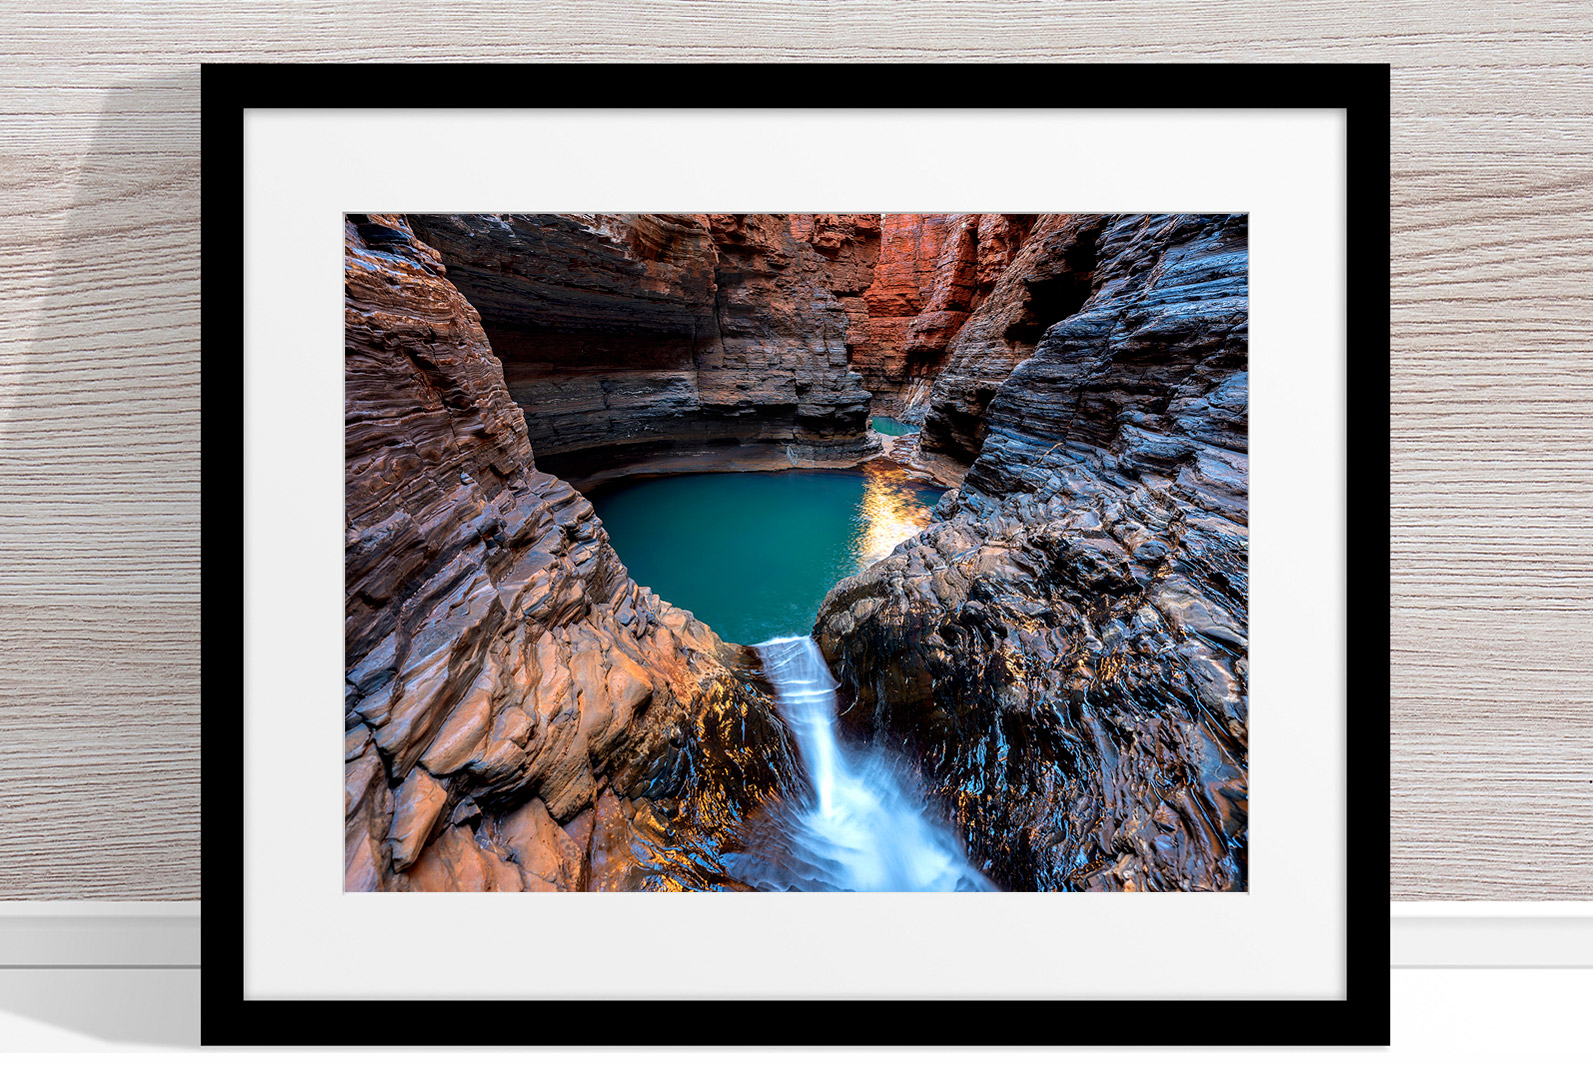 Jason Mazur - 'Regan's Pool, Hancock Gorge 036' Black Frame